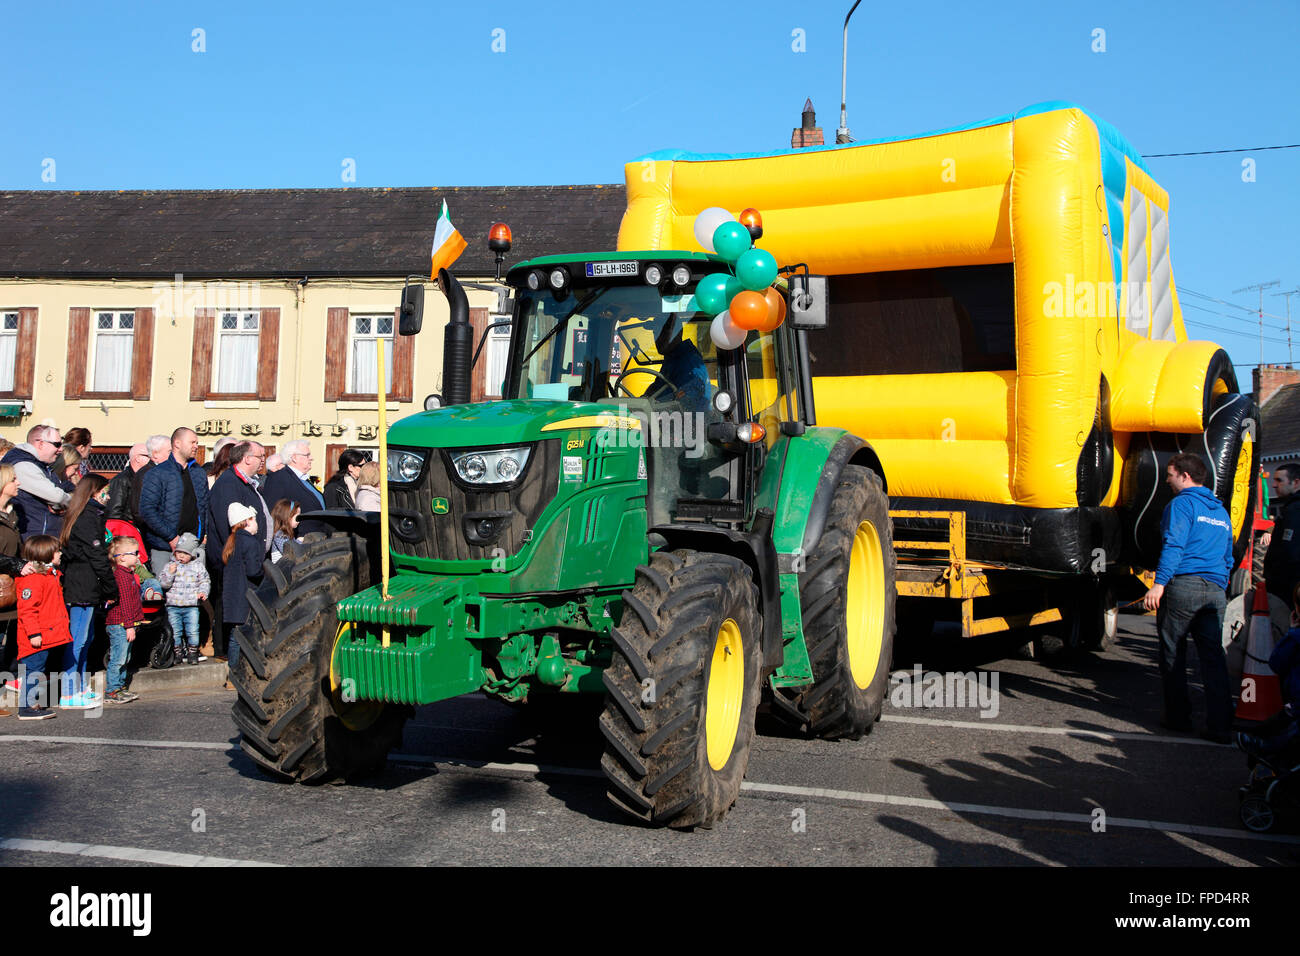 Traktor pulling Hüpfburg in Carrickmacross St. Patricks Day Parade Stockbild